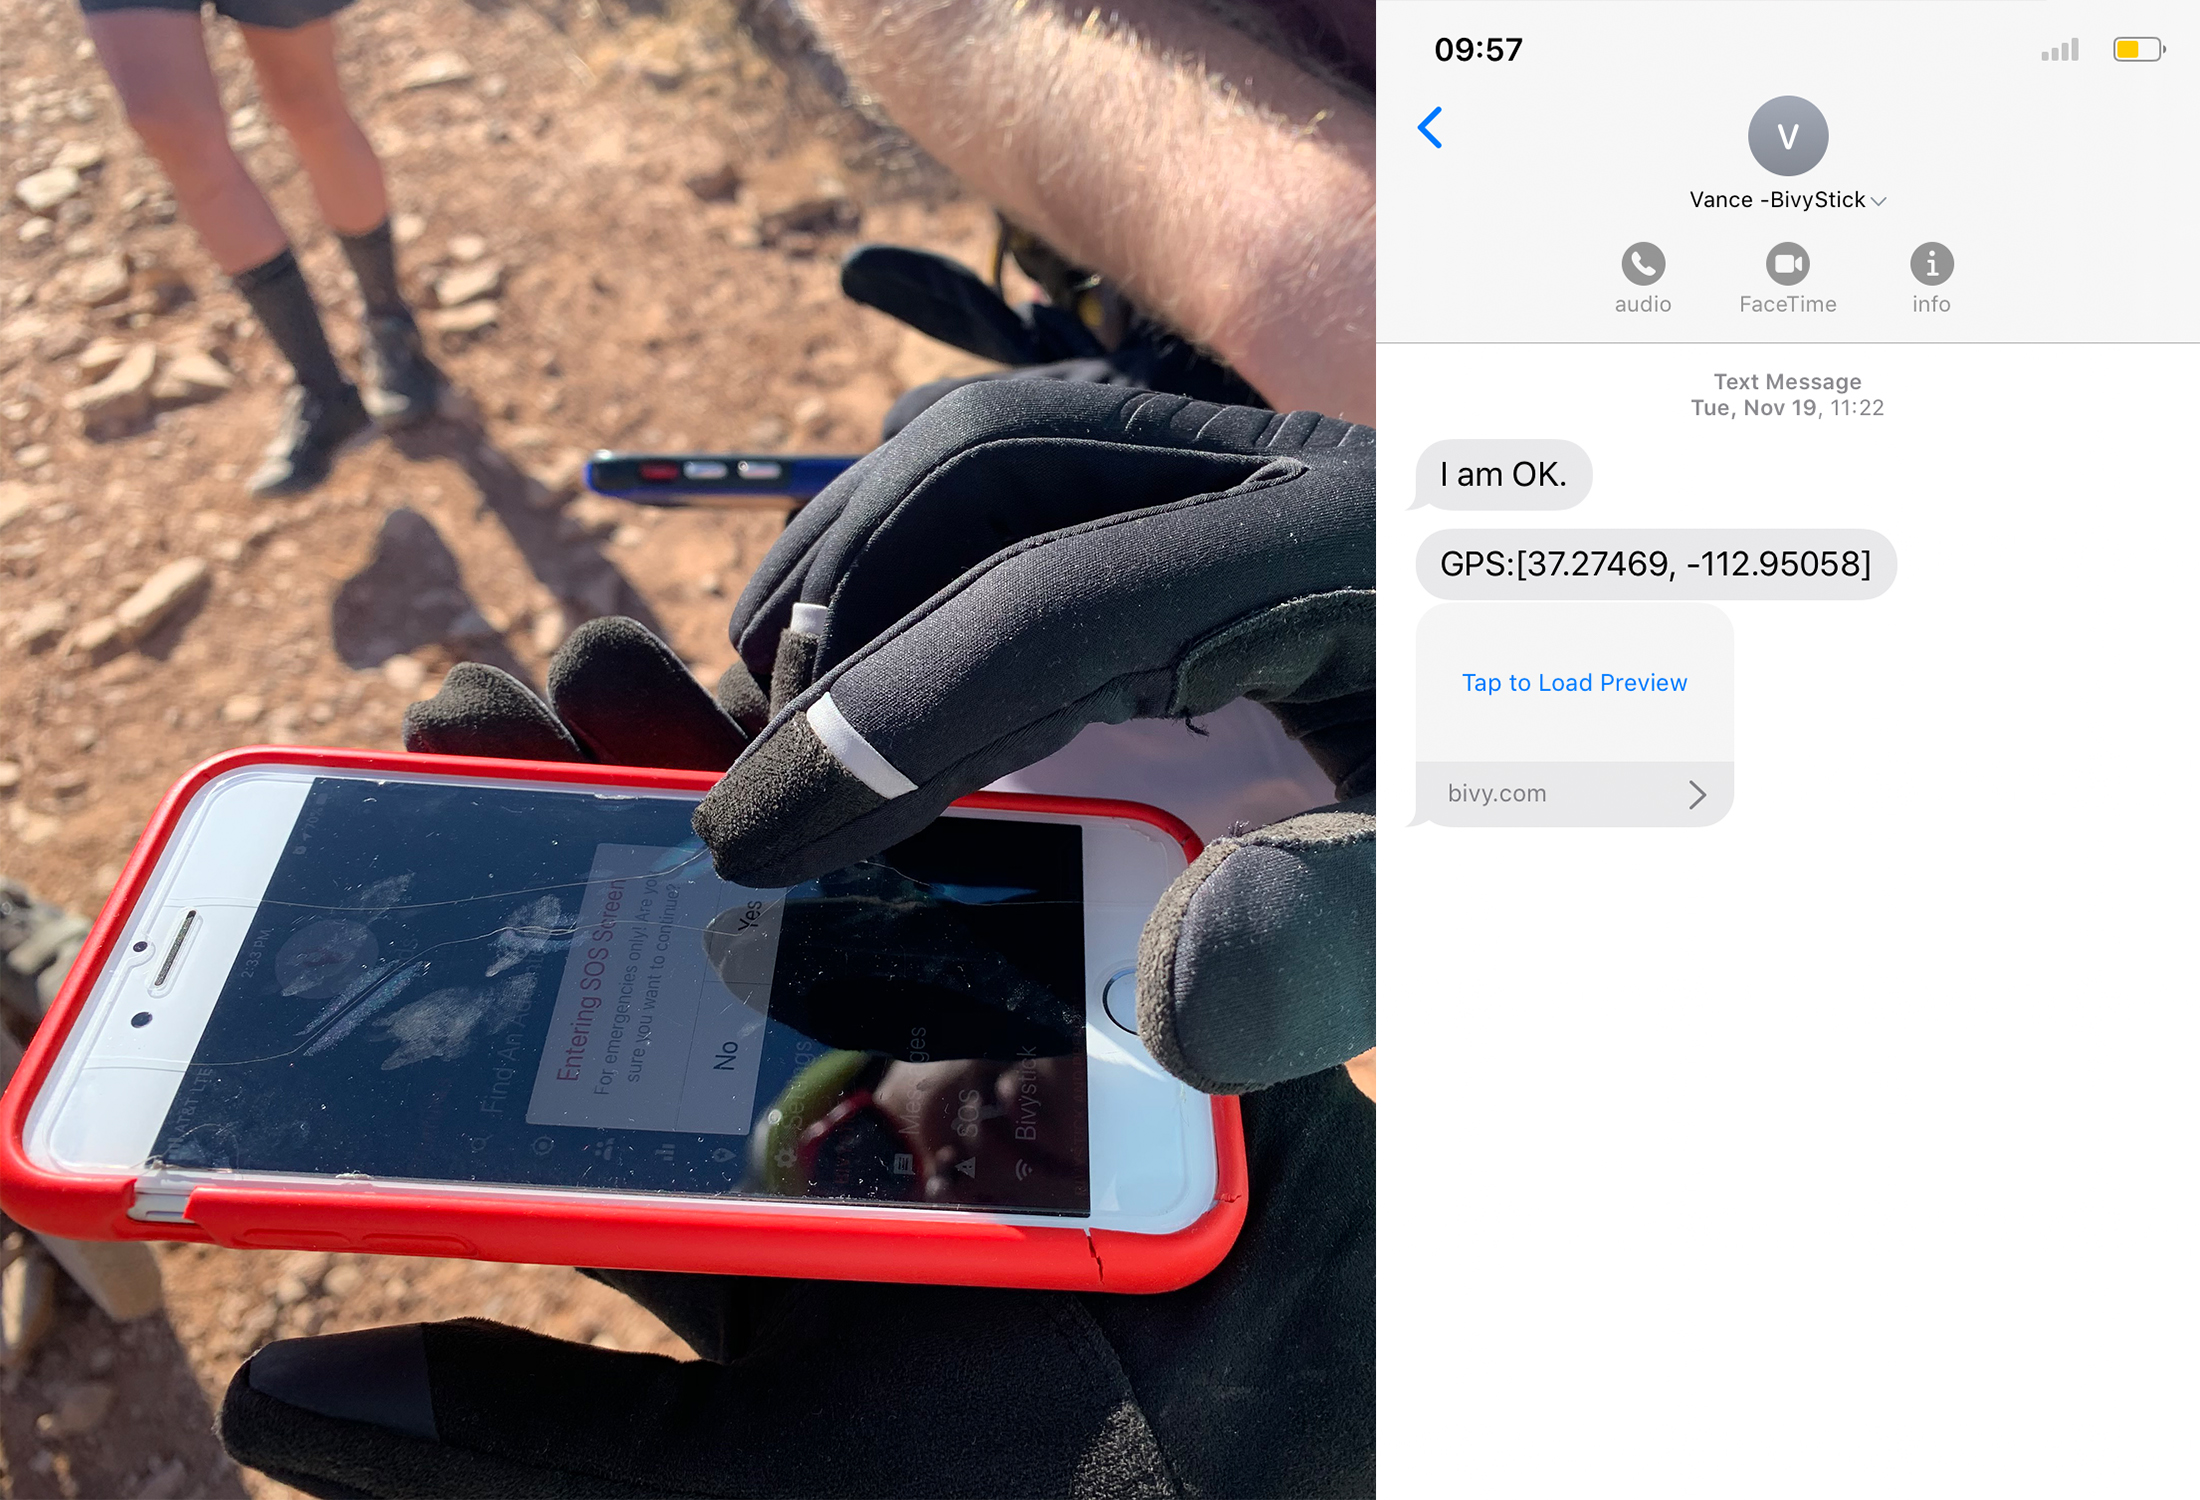 Bivystick app and phone messaging